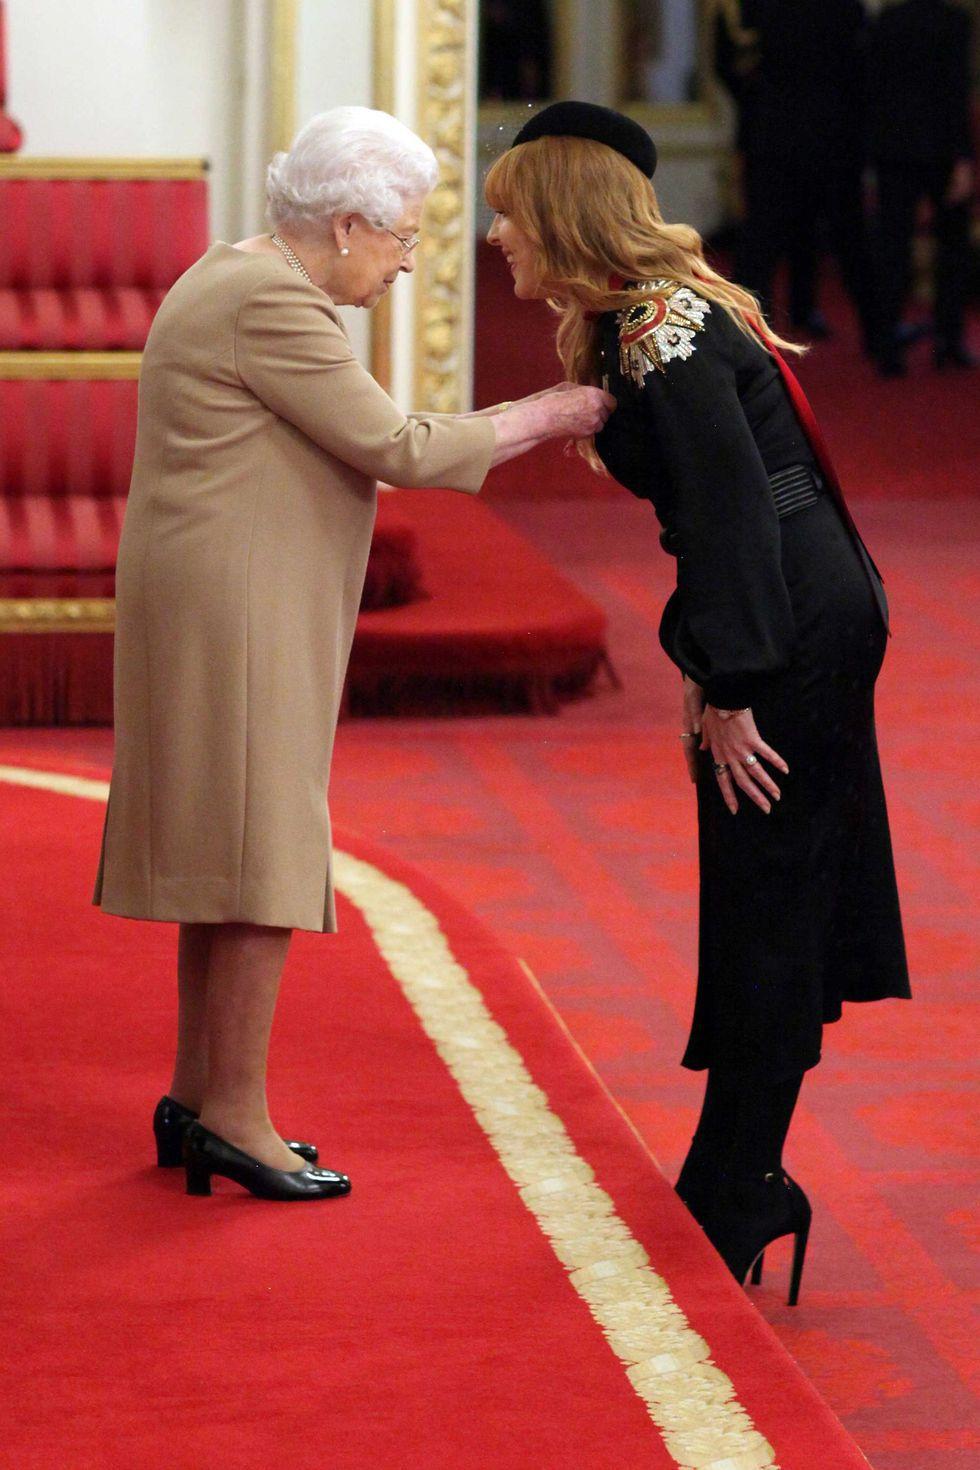 Charlotte Tilbury the Beauty guru  received her MBE at Buckingham Palace